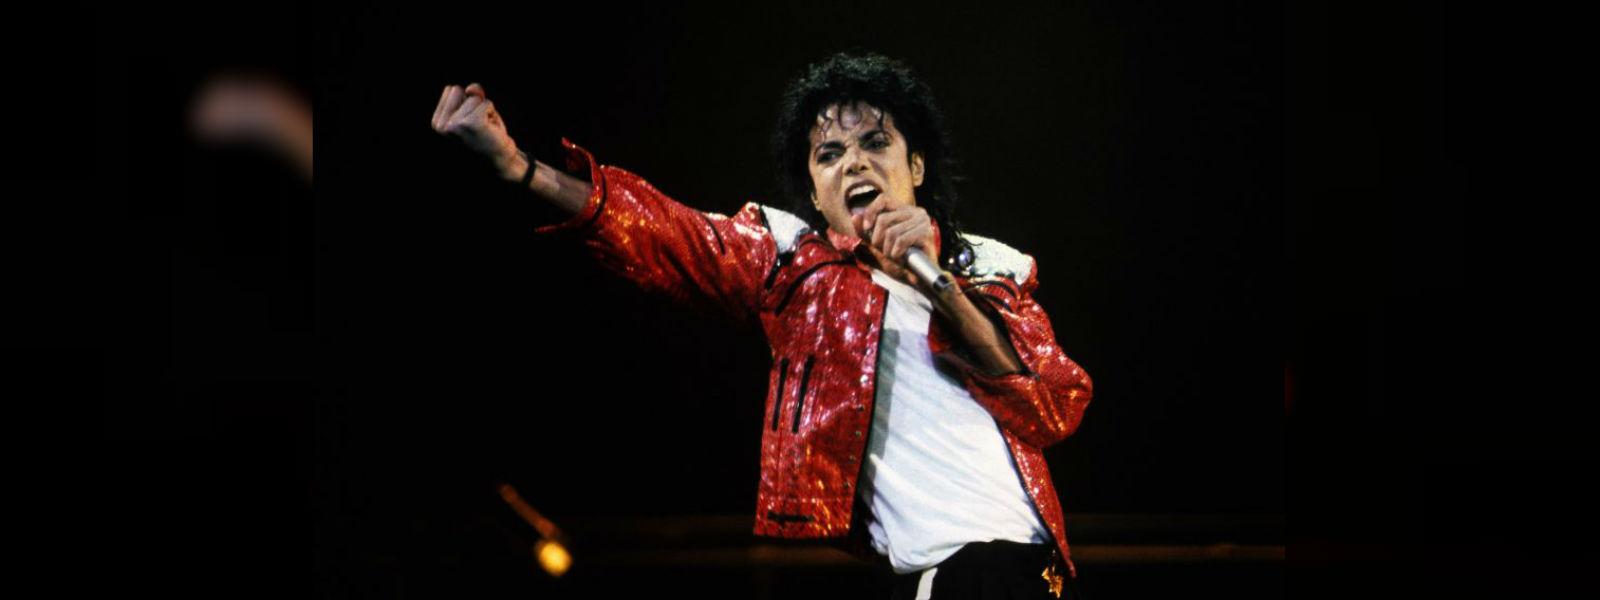 Fans all around the globe prepare to celebrate Michael Jackson's 10th anniversary